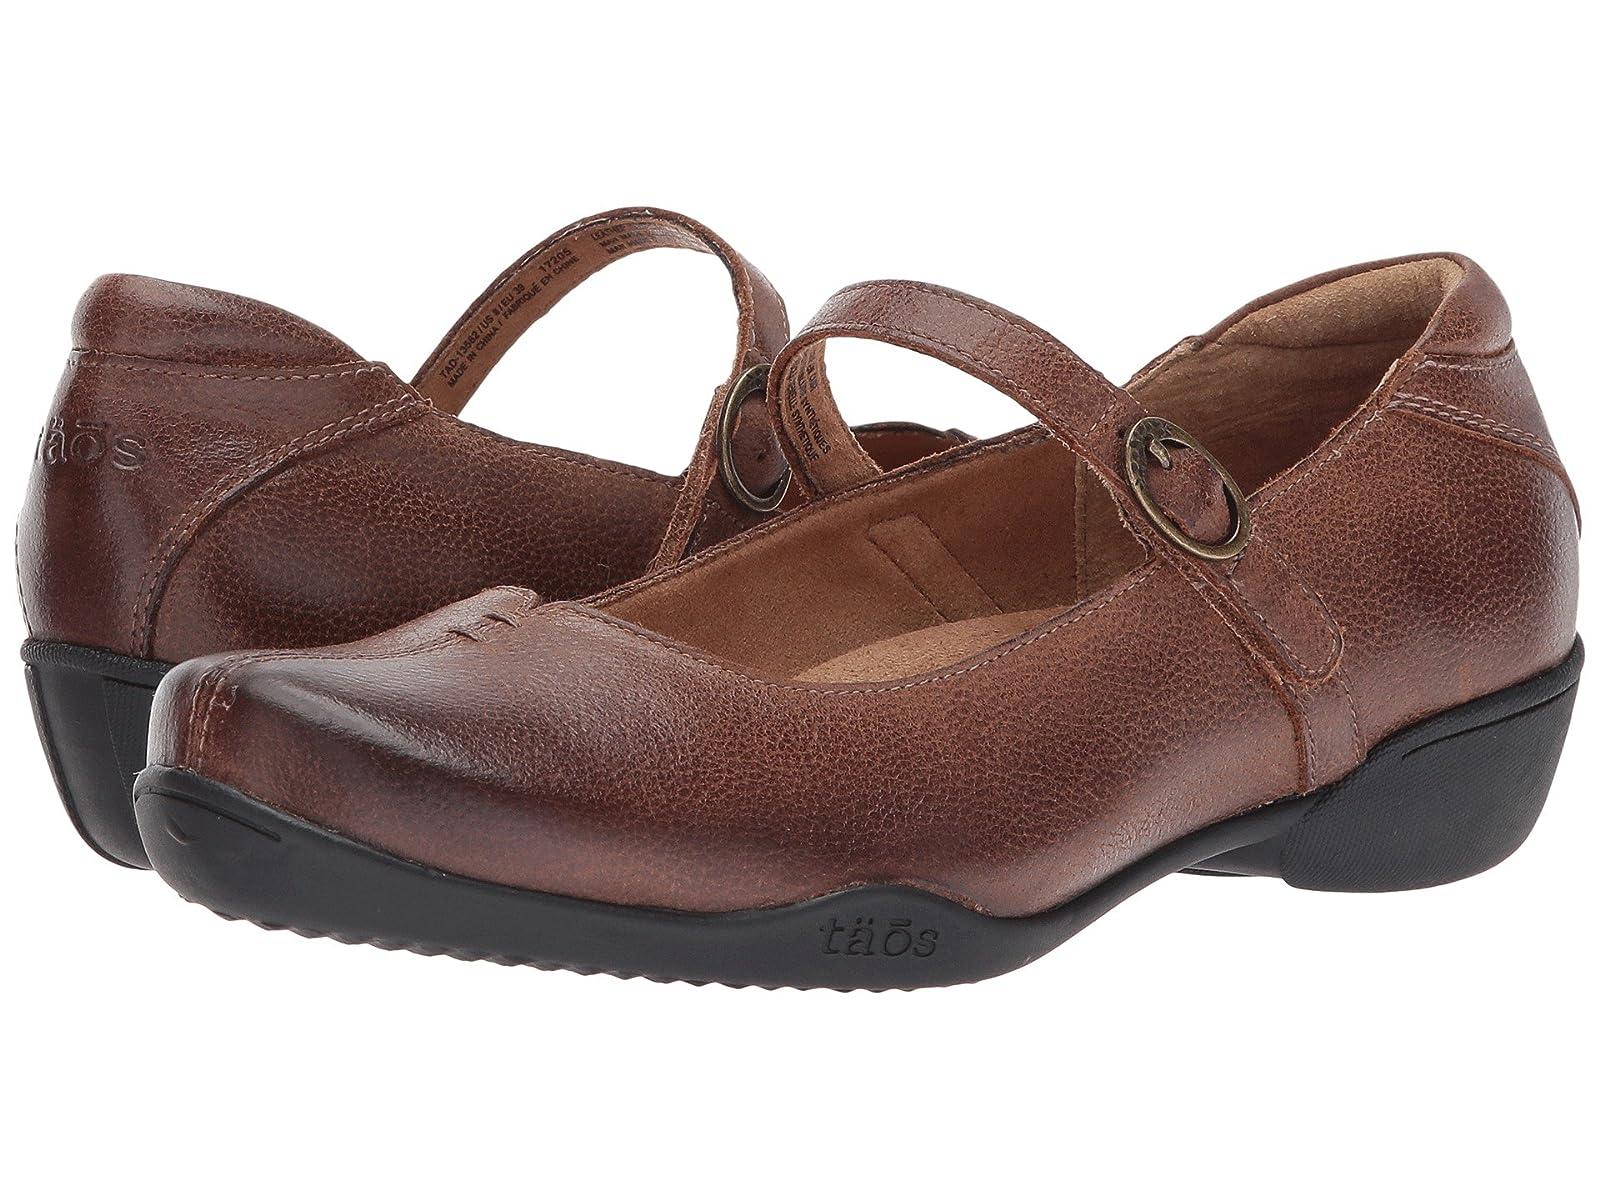 Taos Footwear Ta DahAtmospheric grades have affordable shoes